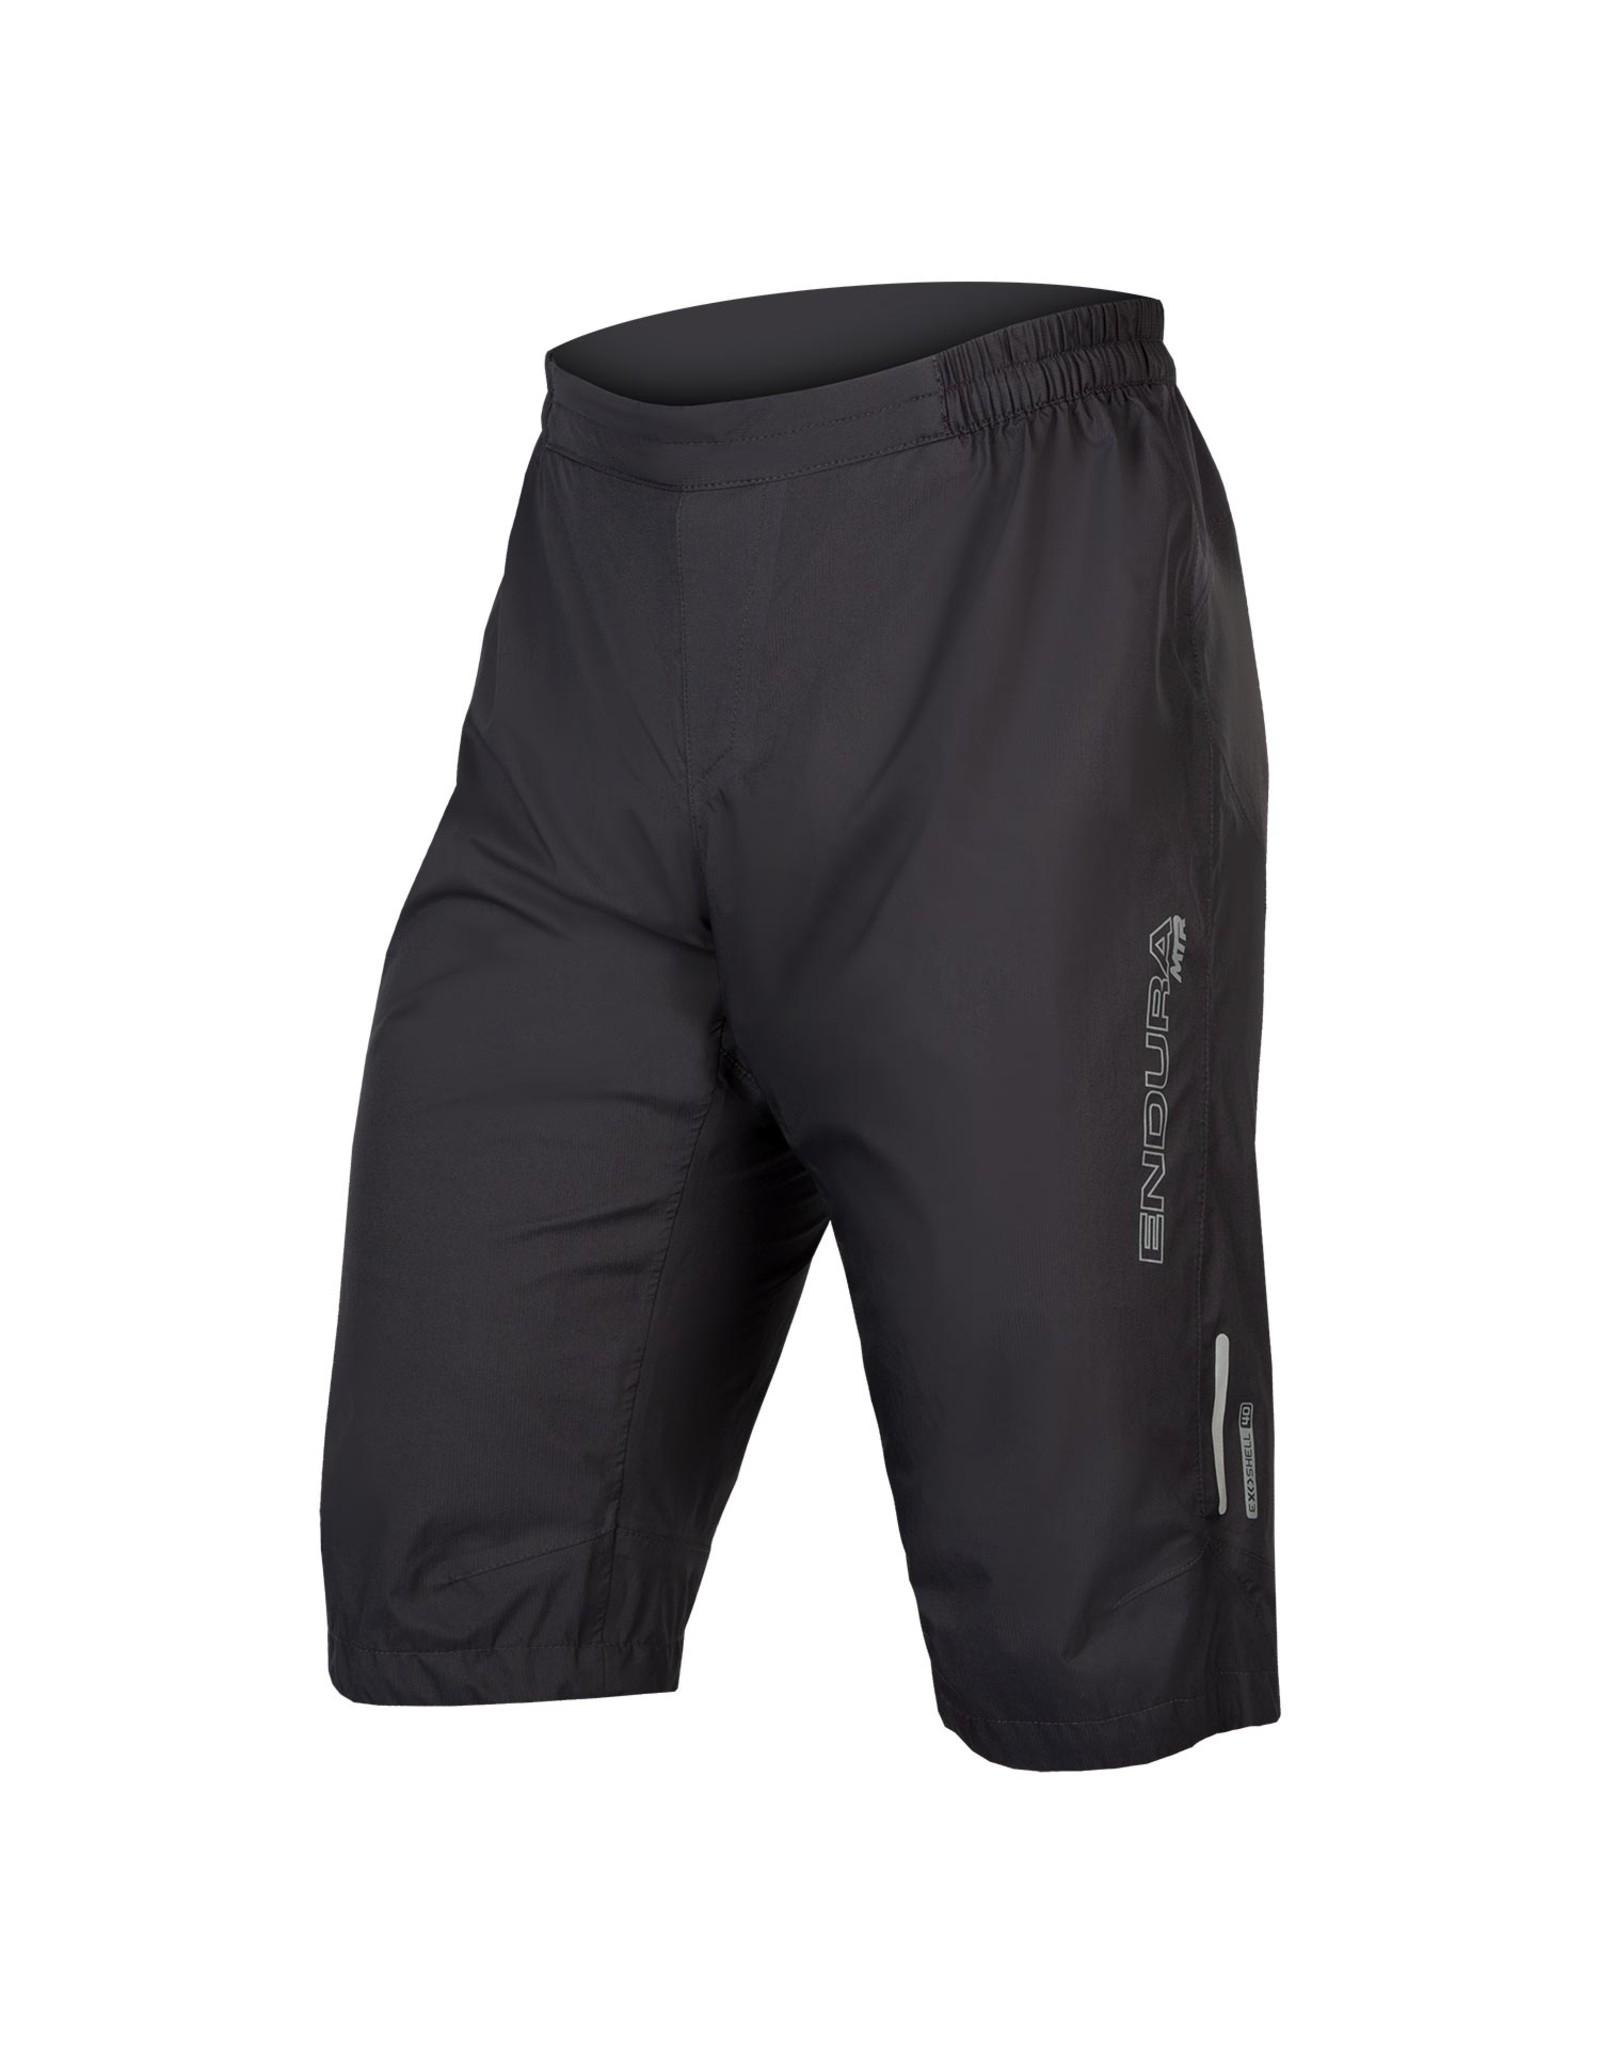 Endura MTR Waterproof Short: Anthracite - XL